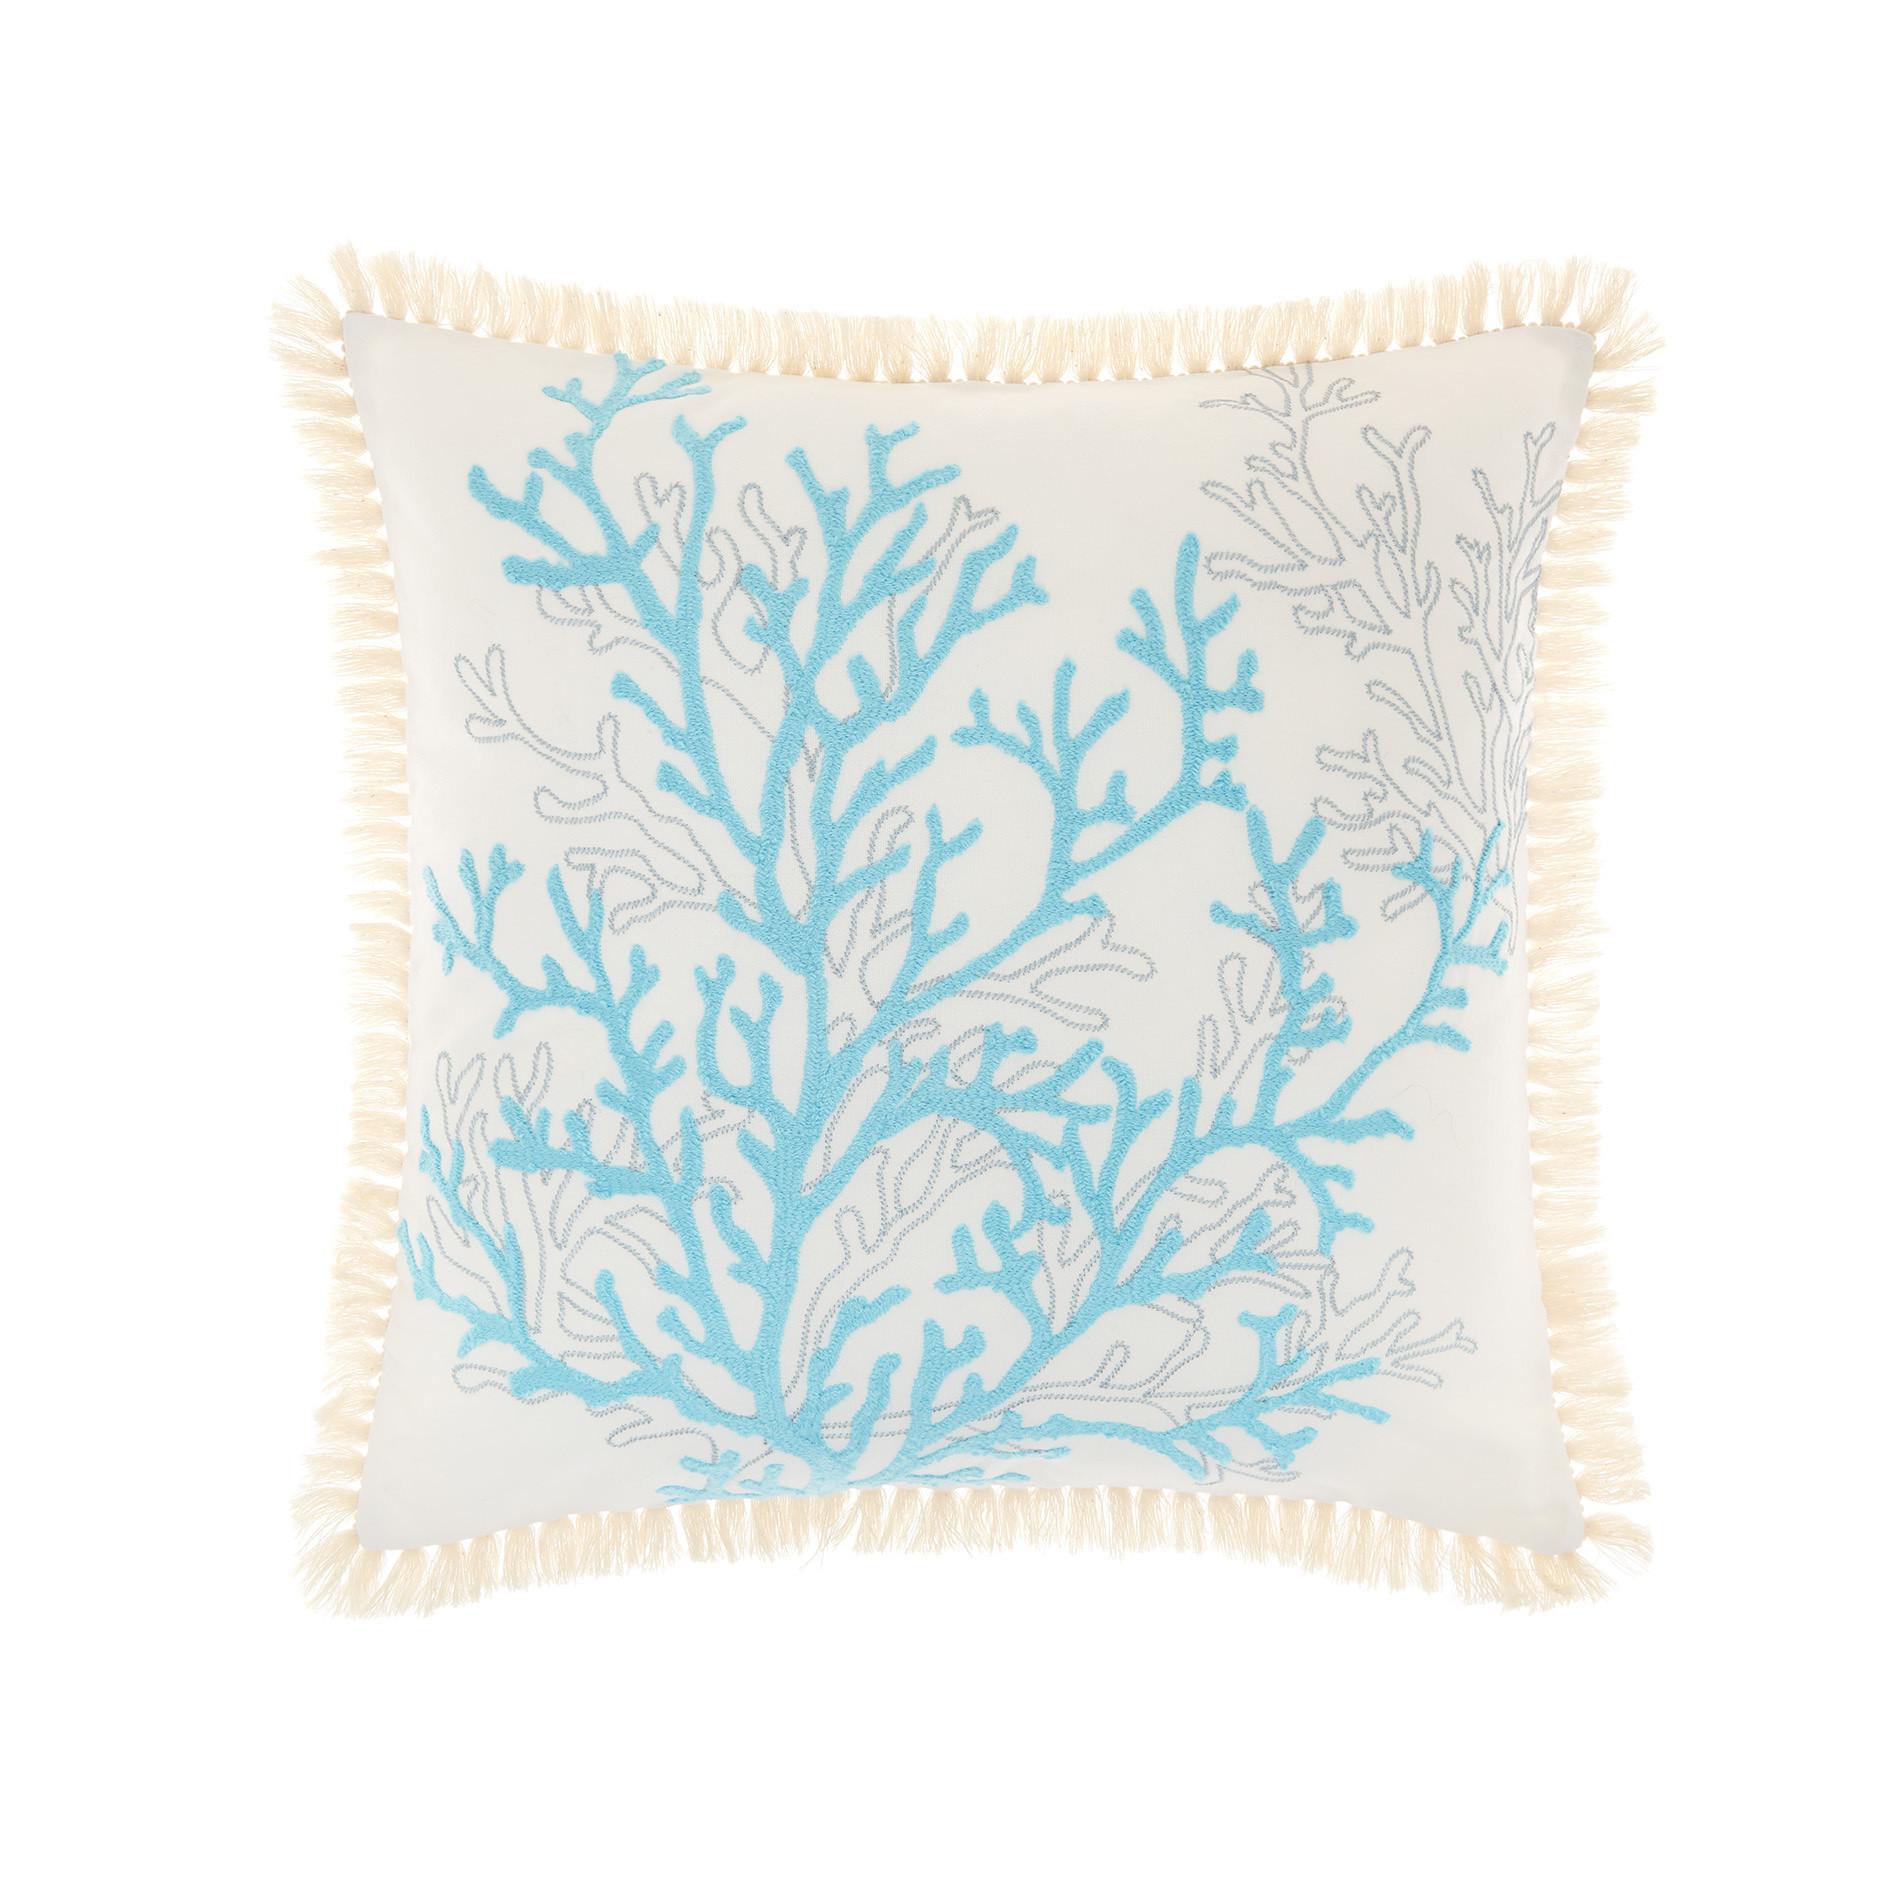 Cuscino ricamo coralli 45x45cm, Azzurro, large image number 0